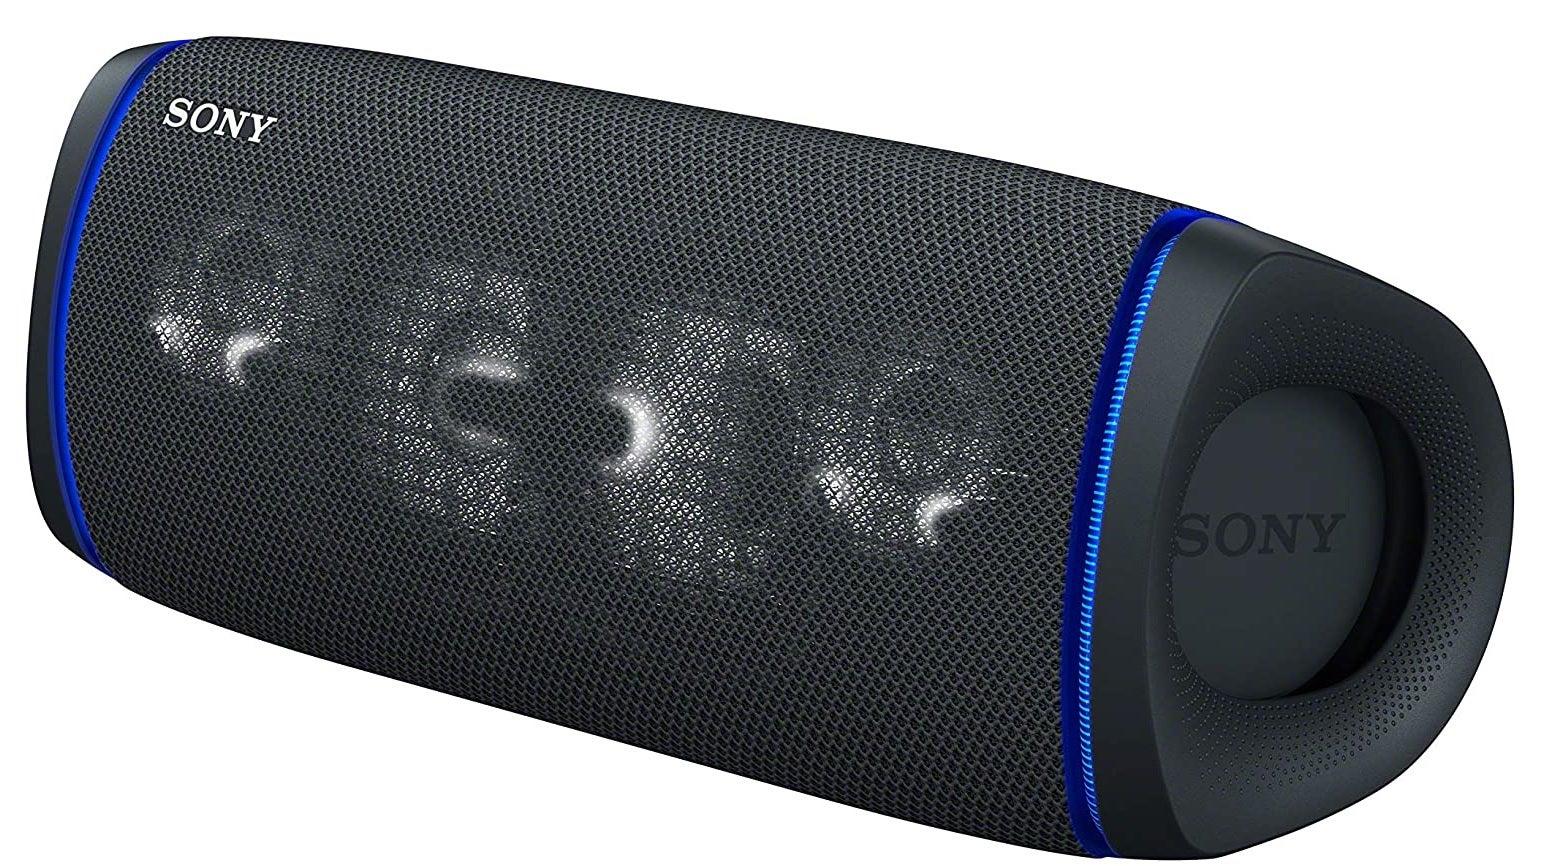 Sony SRSXB43 Portable Speaker